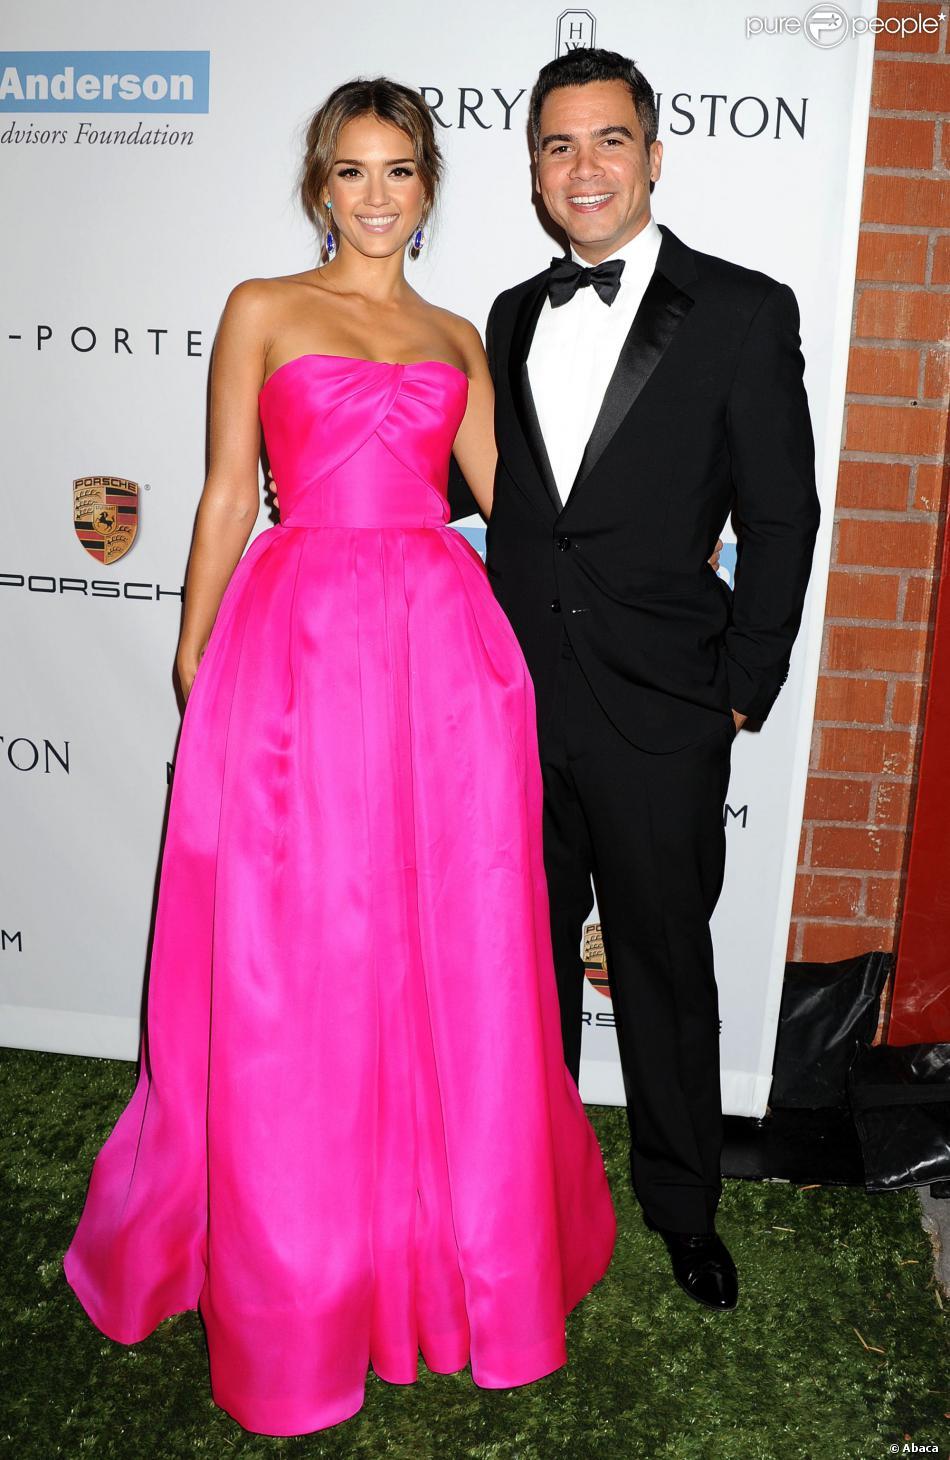 Jessica Alba et son mari Cash Warren assistent au gala Baby2Baby à la Book Bindery. Culver City, le 9 novembre 2013.